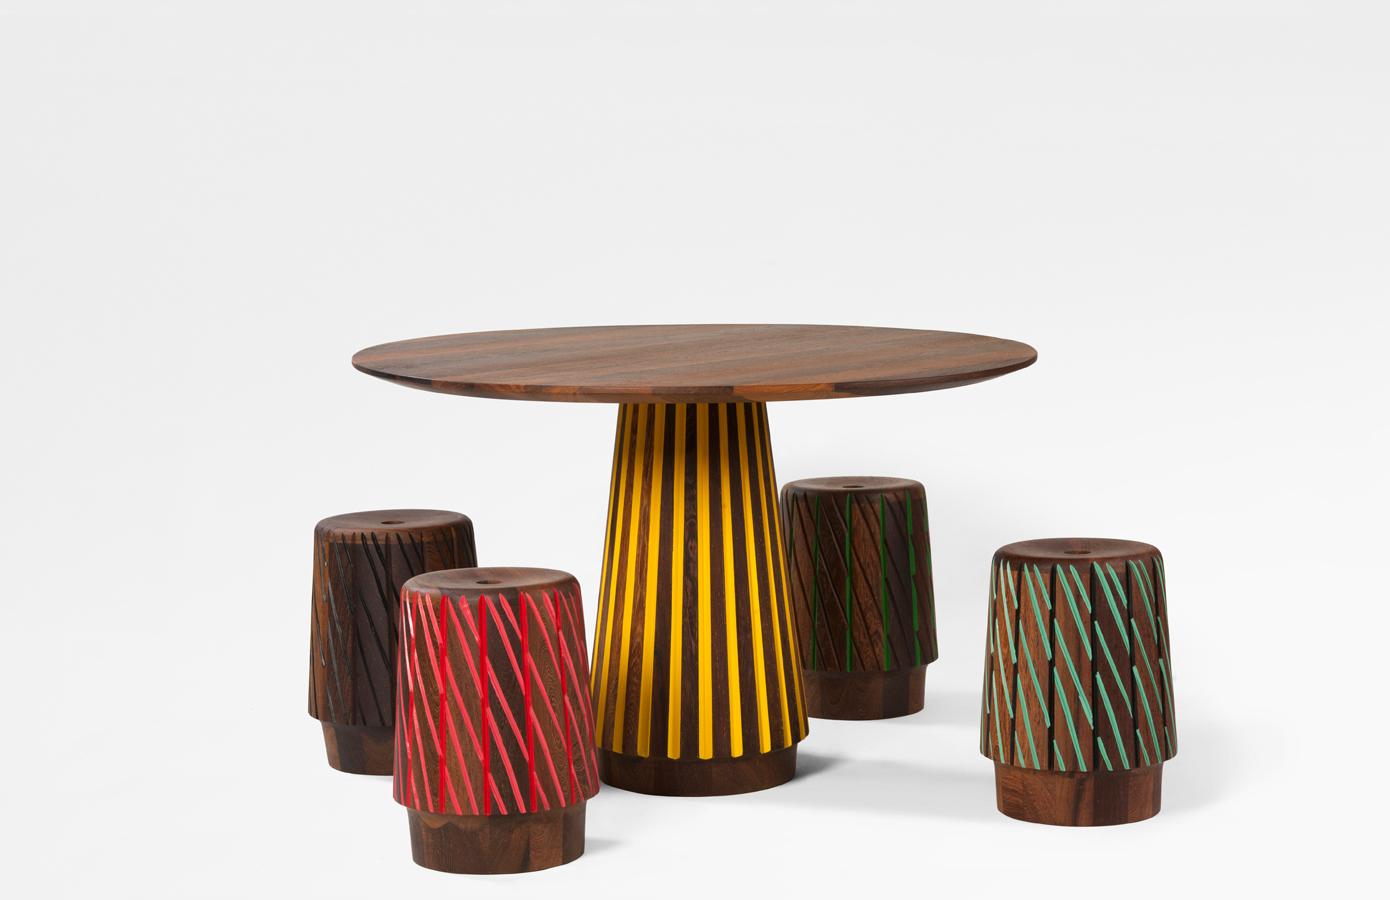 Photo Courtesy of Mabeo Furniture